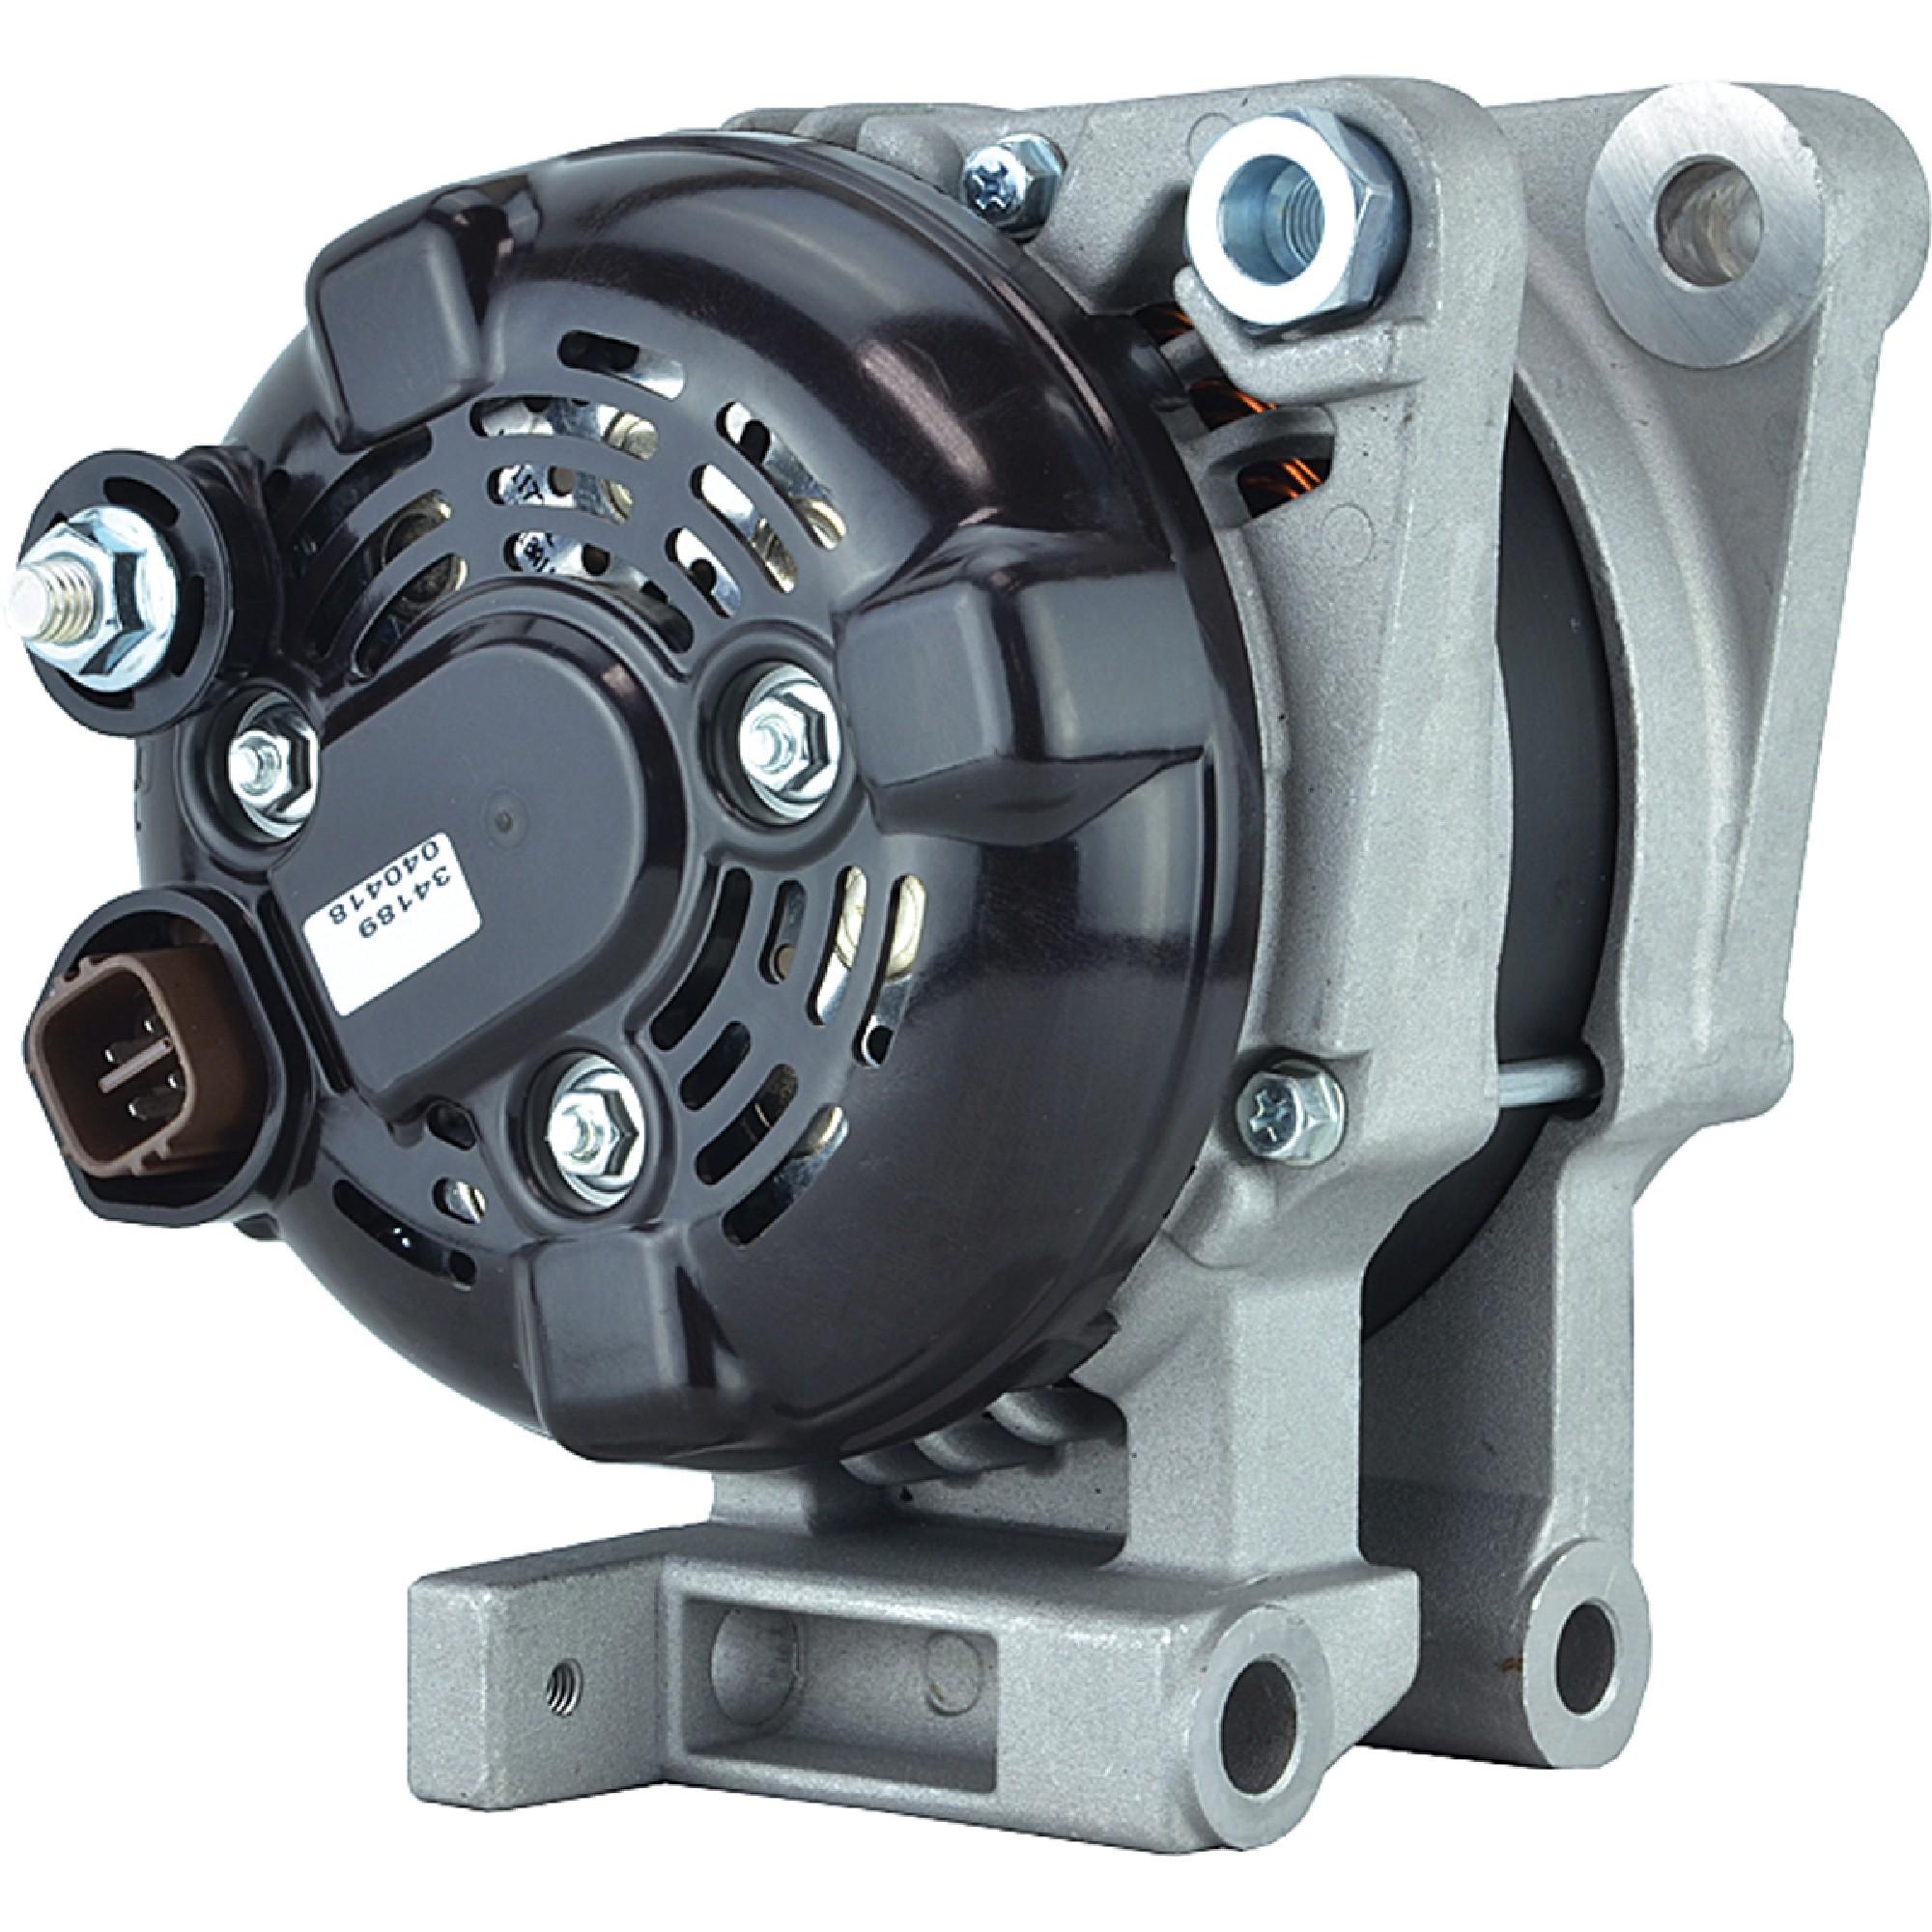 New Alternator For Suzuki KIZASHI 12V 130 Amp 2010-2013 104210-1070 11525